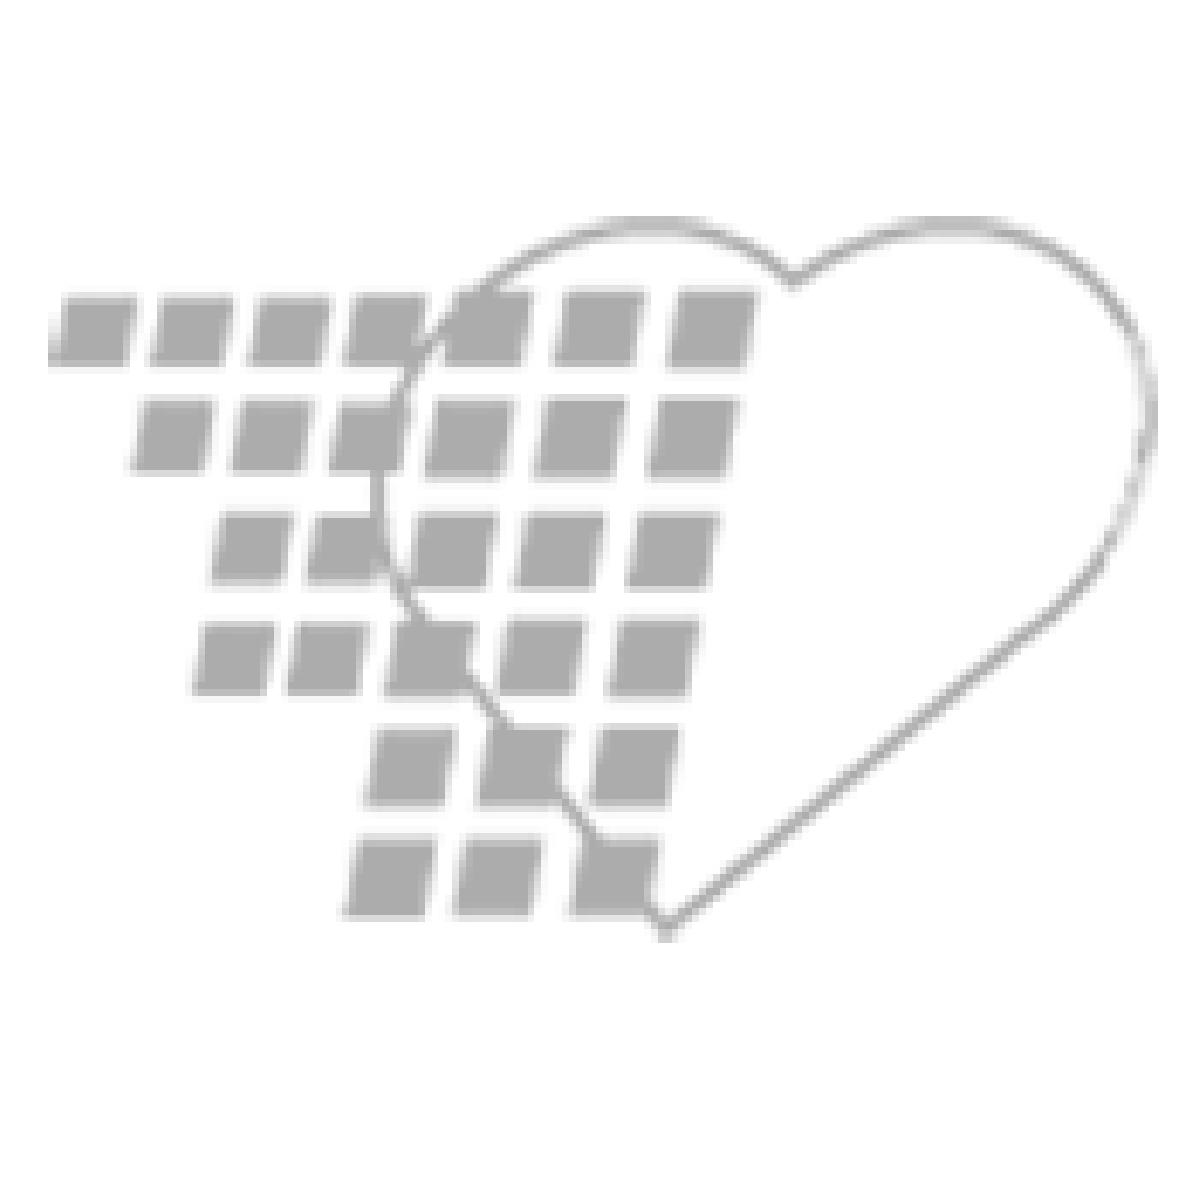 11-94-0051 Laerdal SimPad® eLearning (8 Licenses)